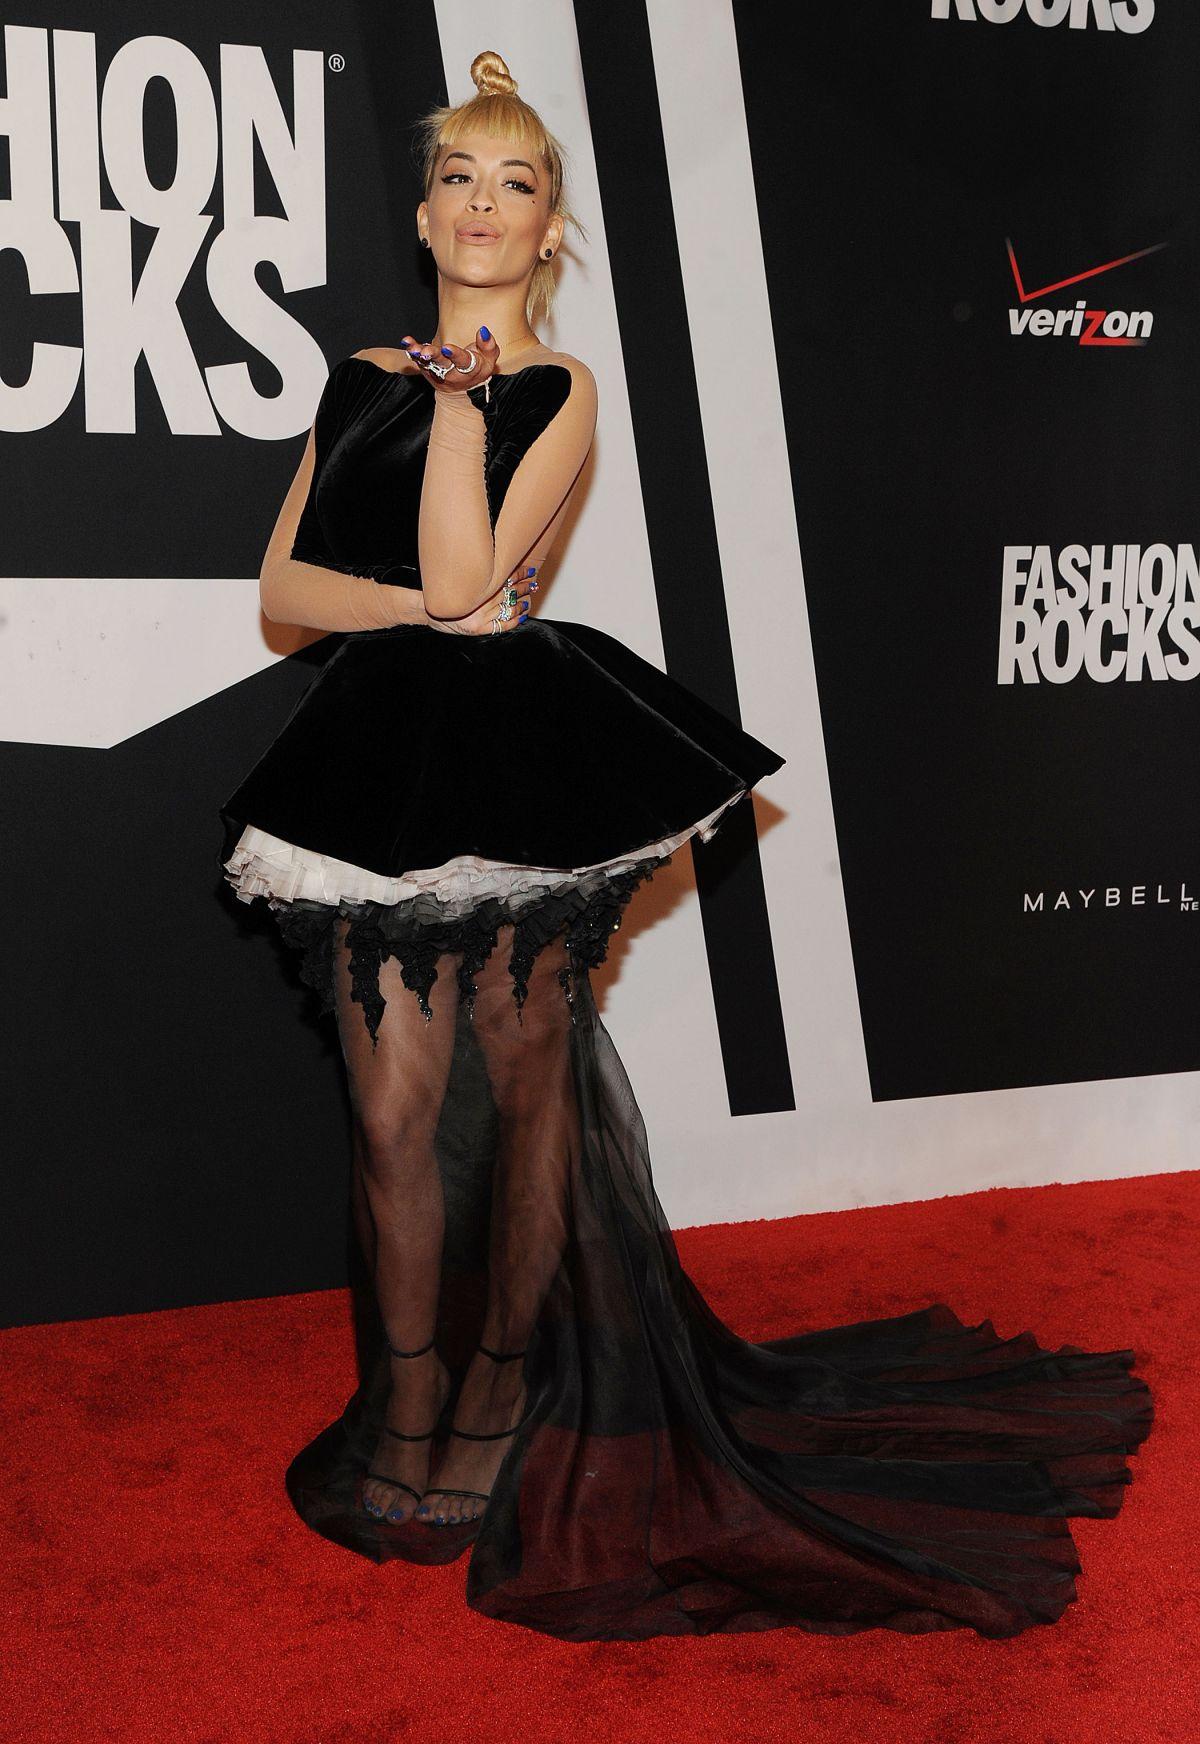 RITA ORA at Fashion Rocks 2014 in New York